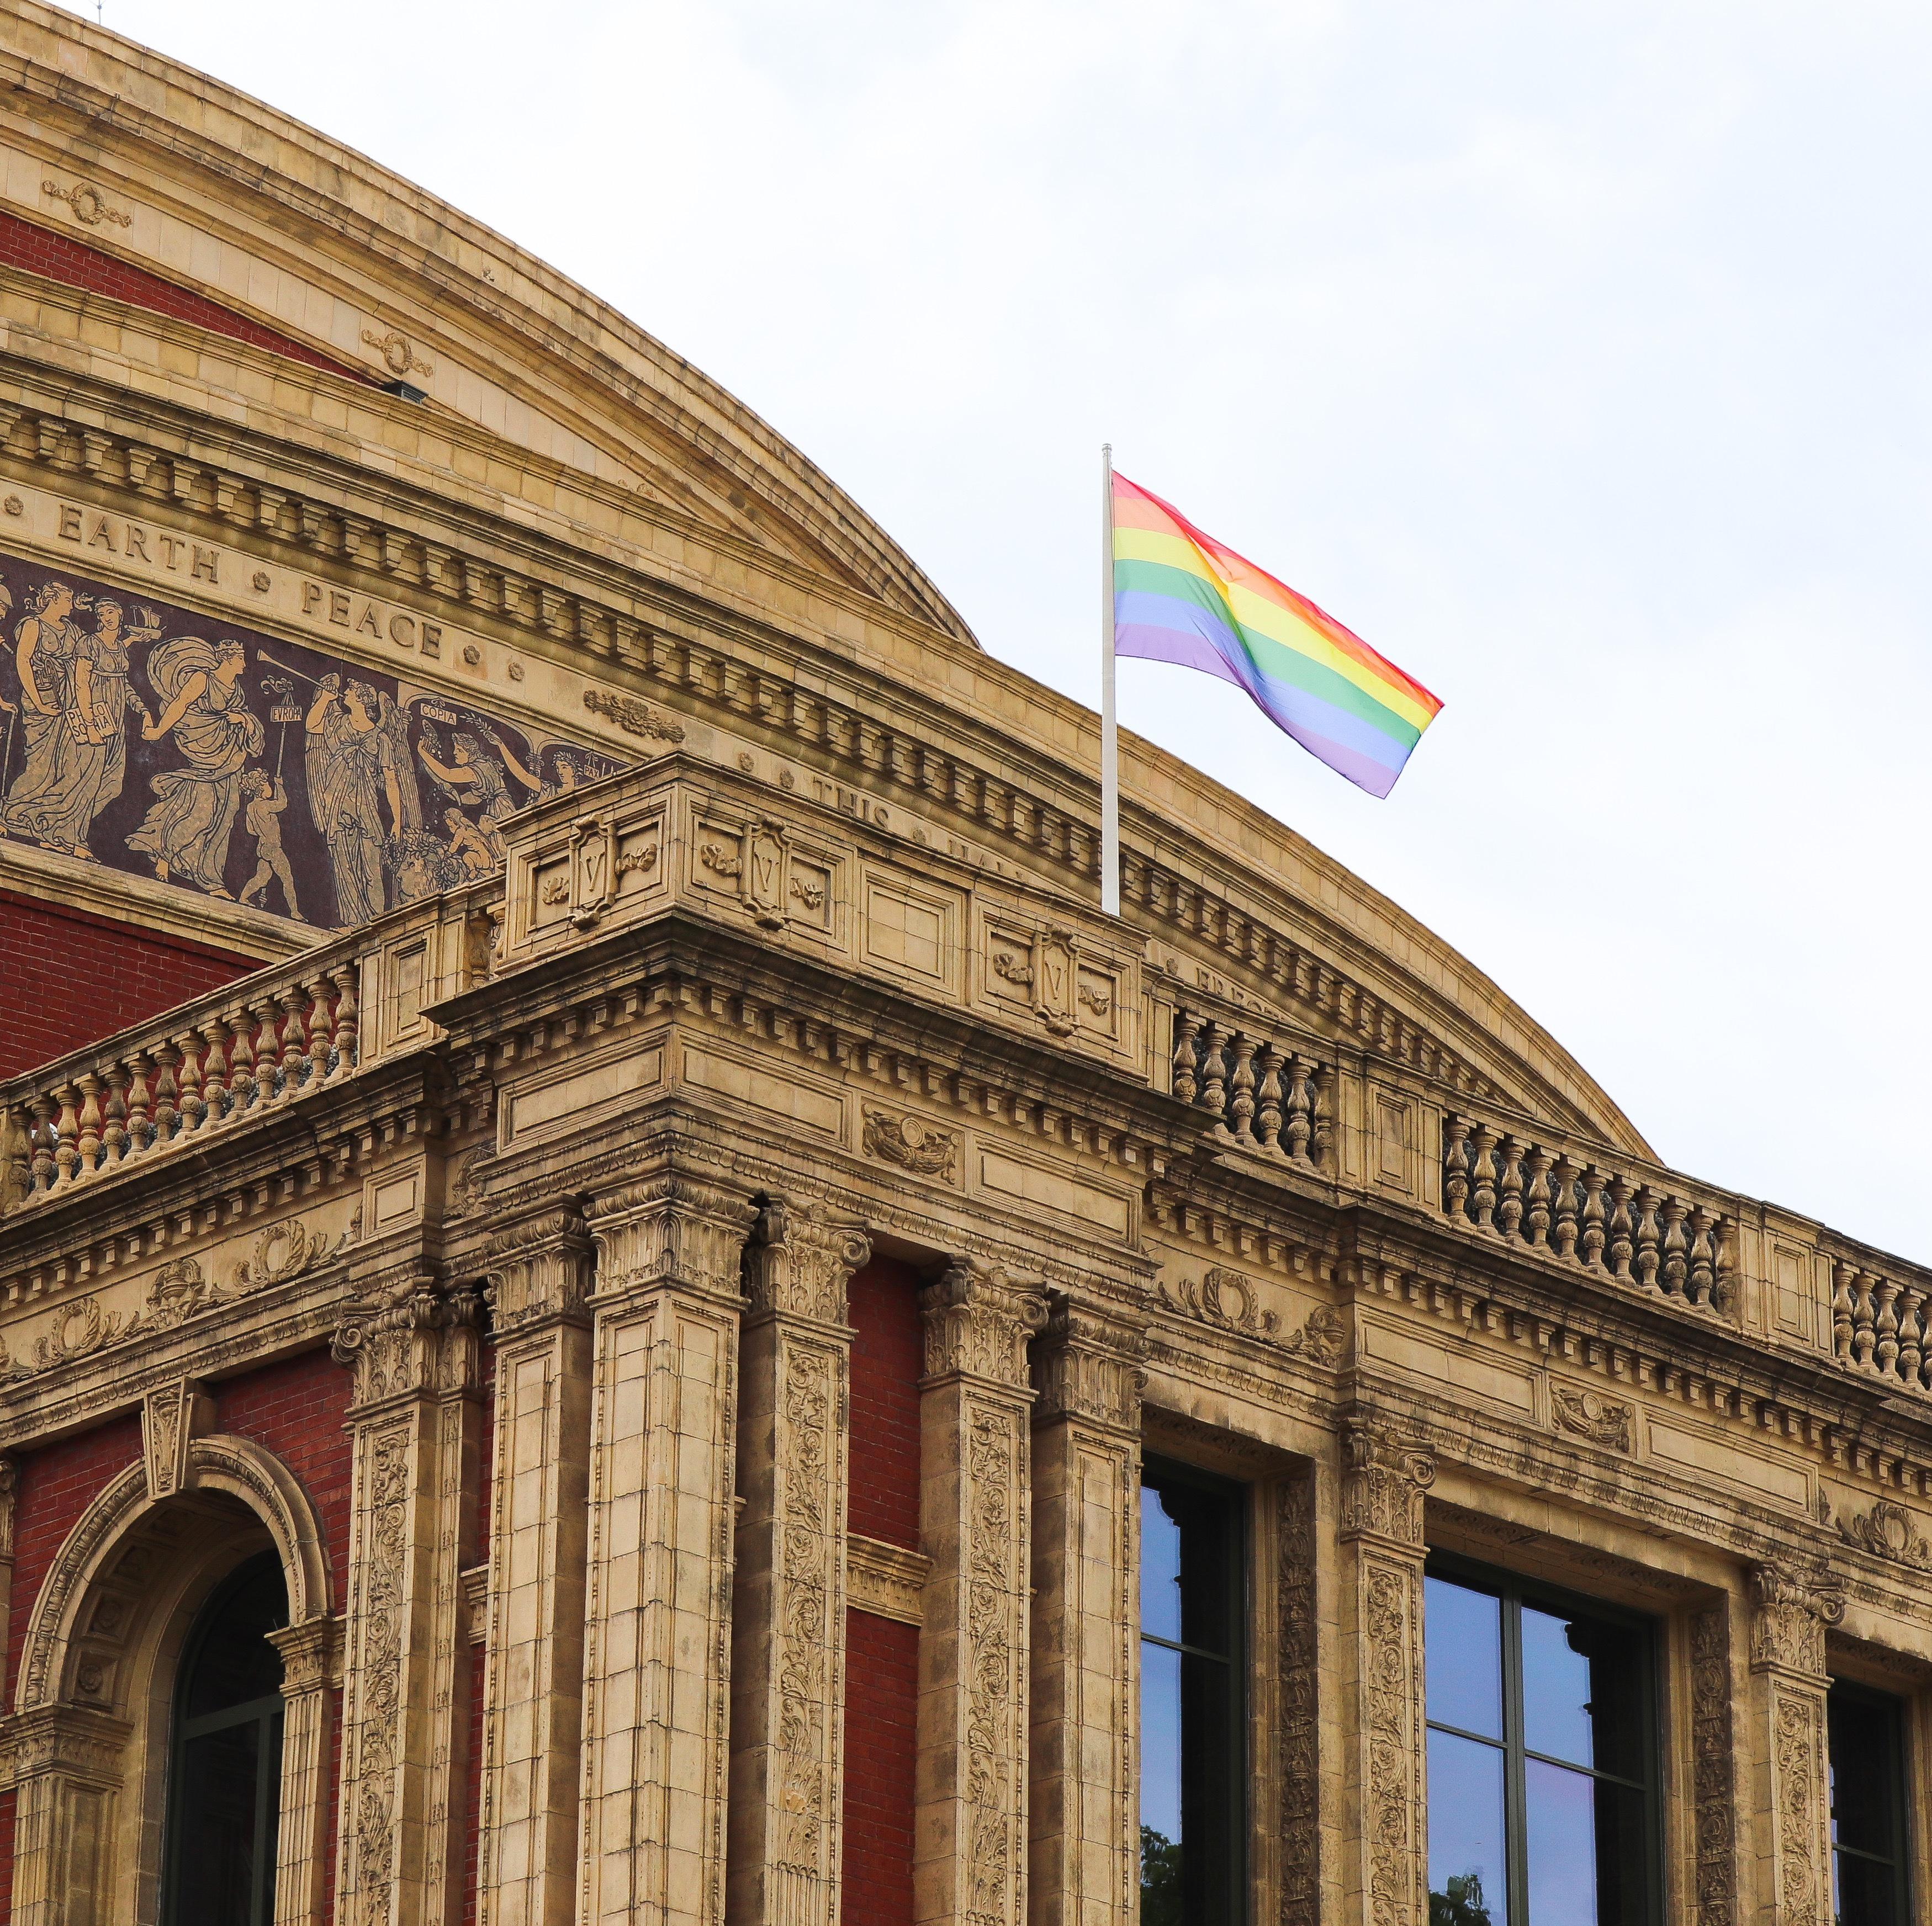 Pride flag flying above Royal Albert Hall